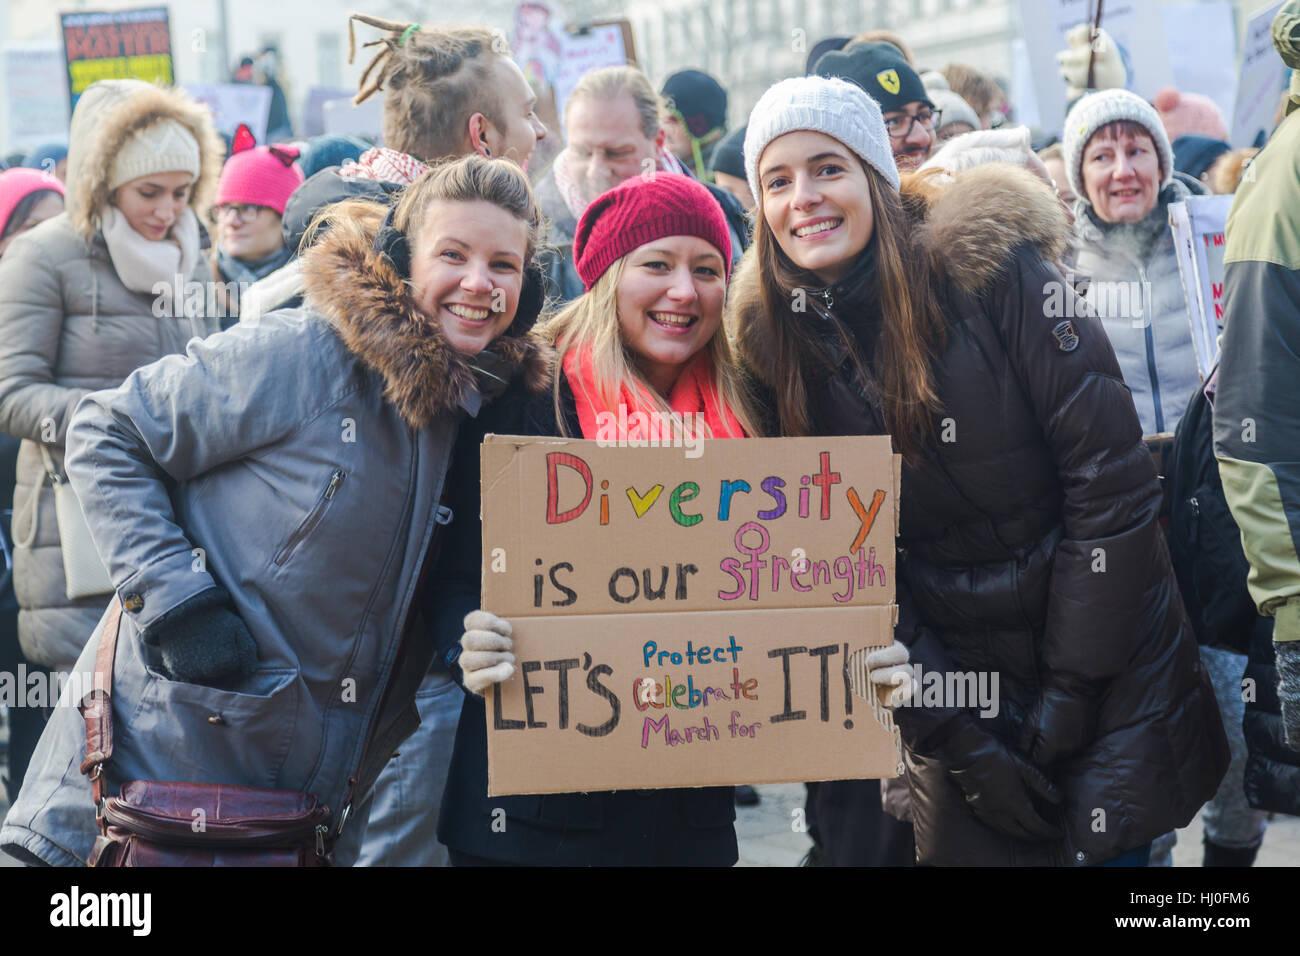 Vienna Austria 21st Jan 2017 A Group Of Girls Holding